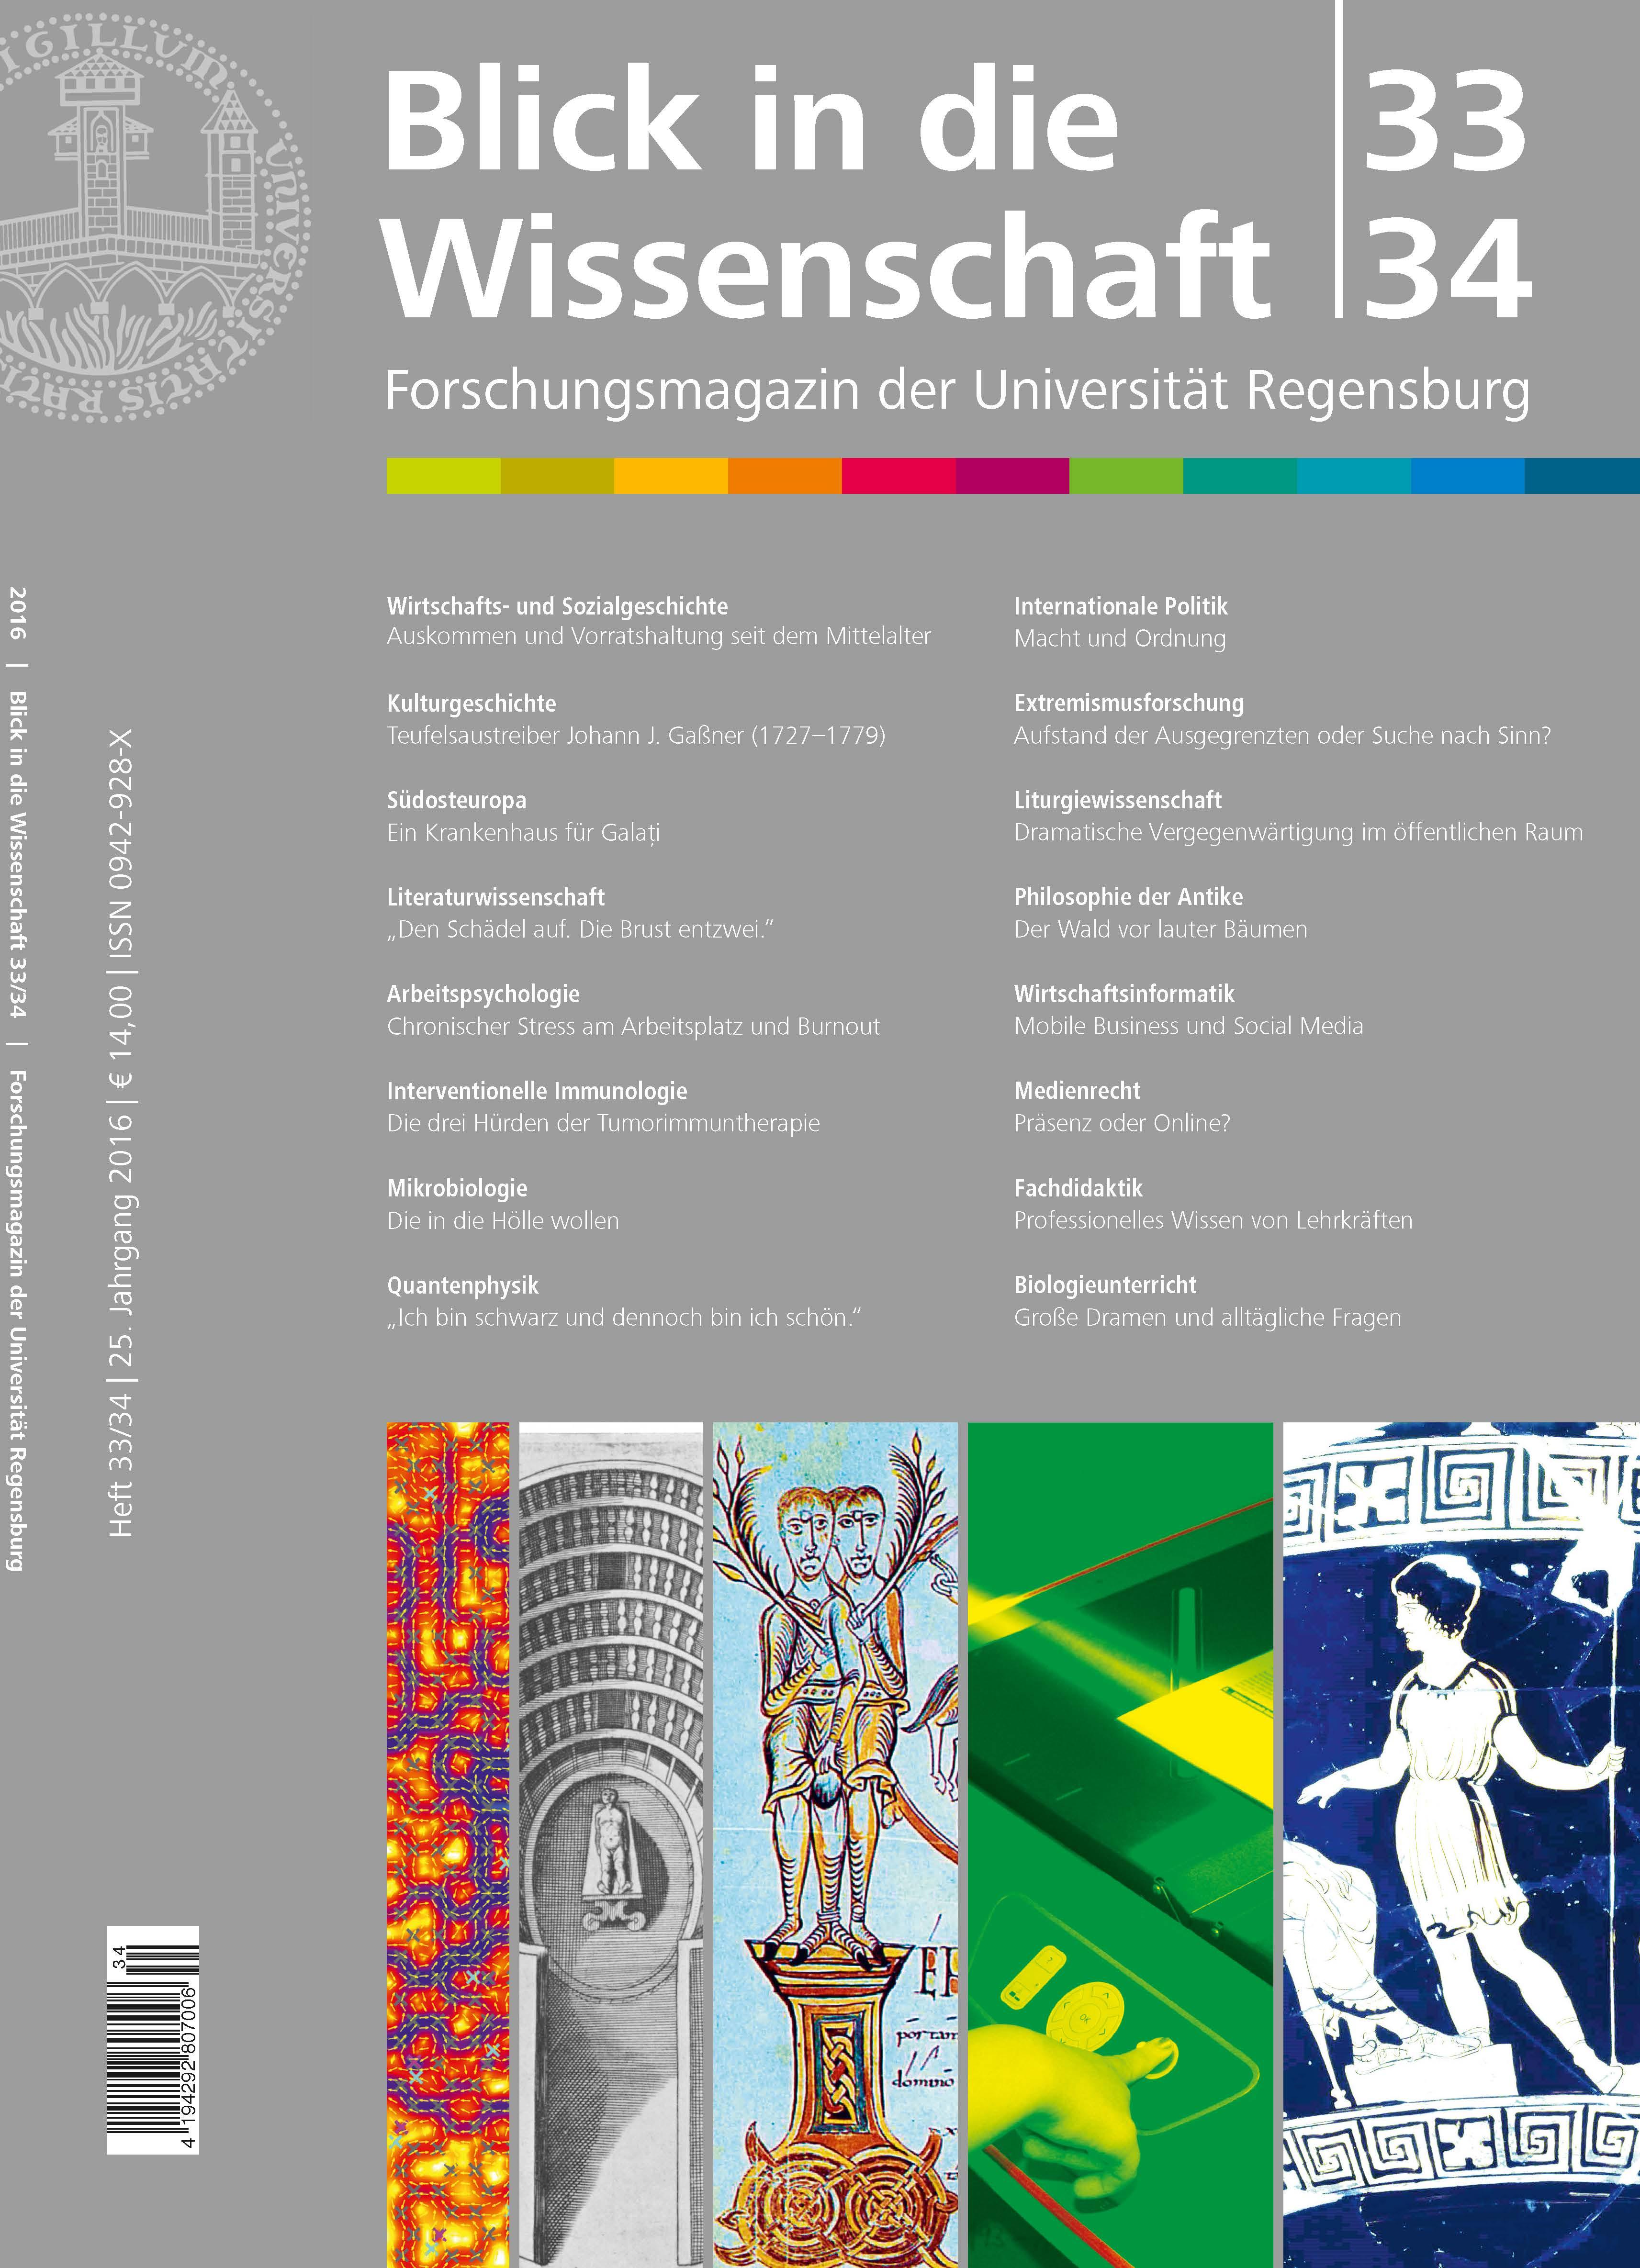 Forschungsmagazin der Universität Regensburg